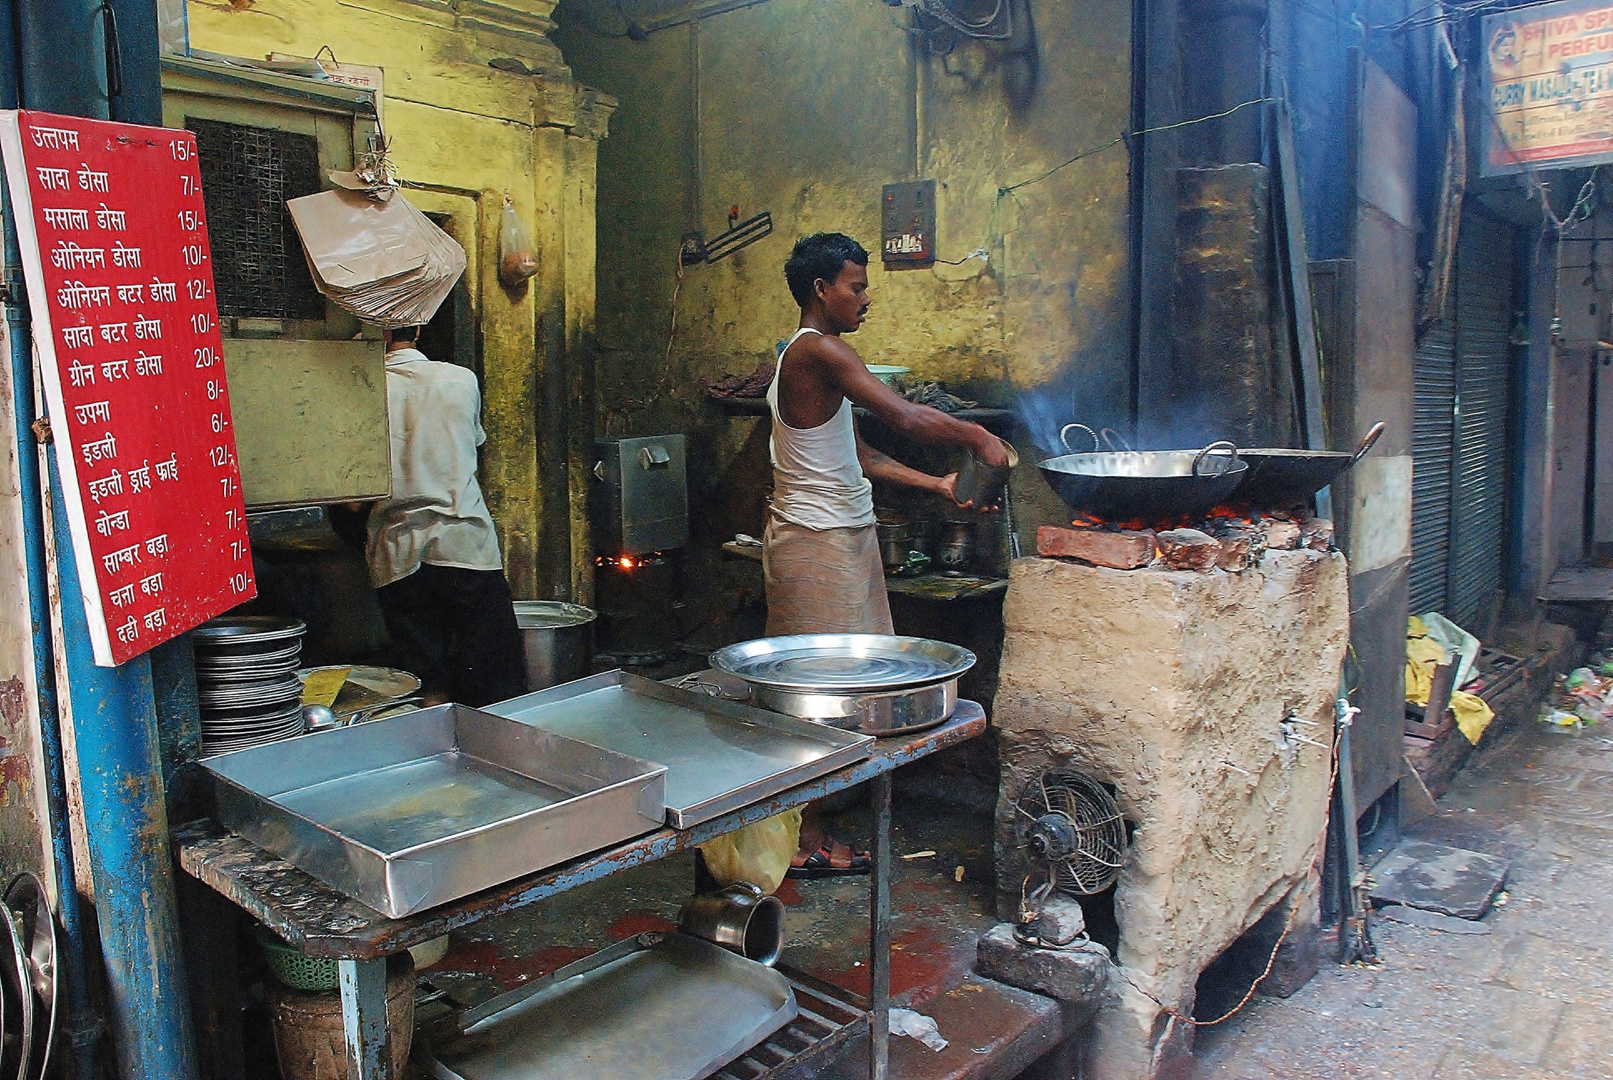 Strassenküche in Varanasi